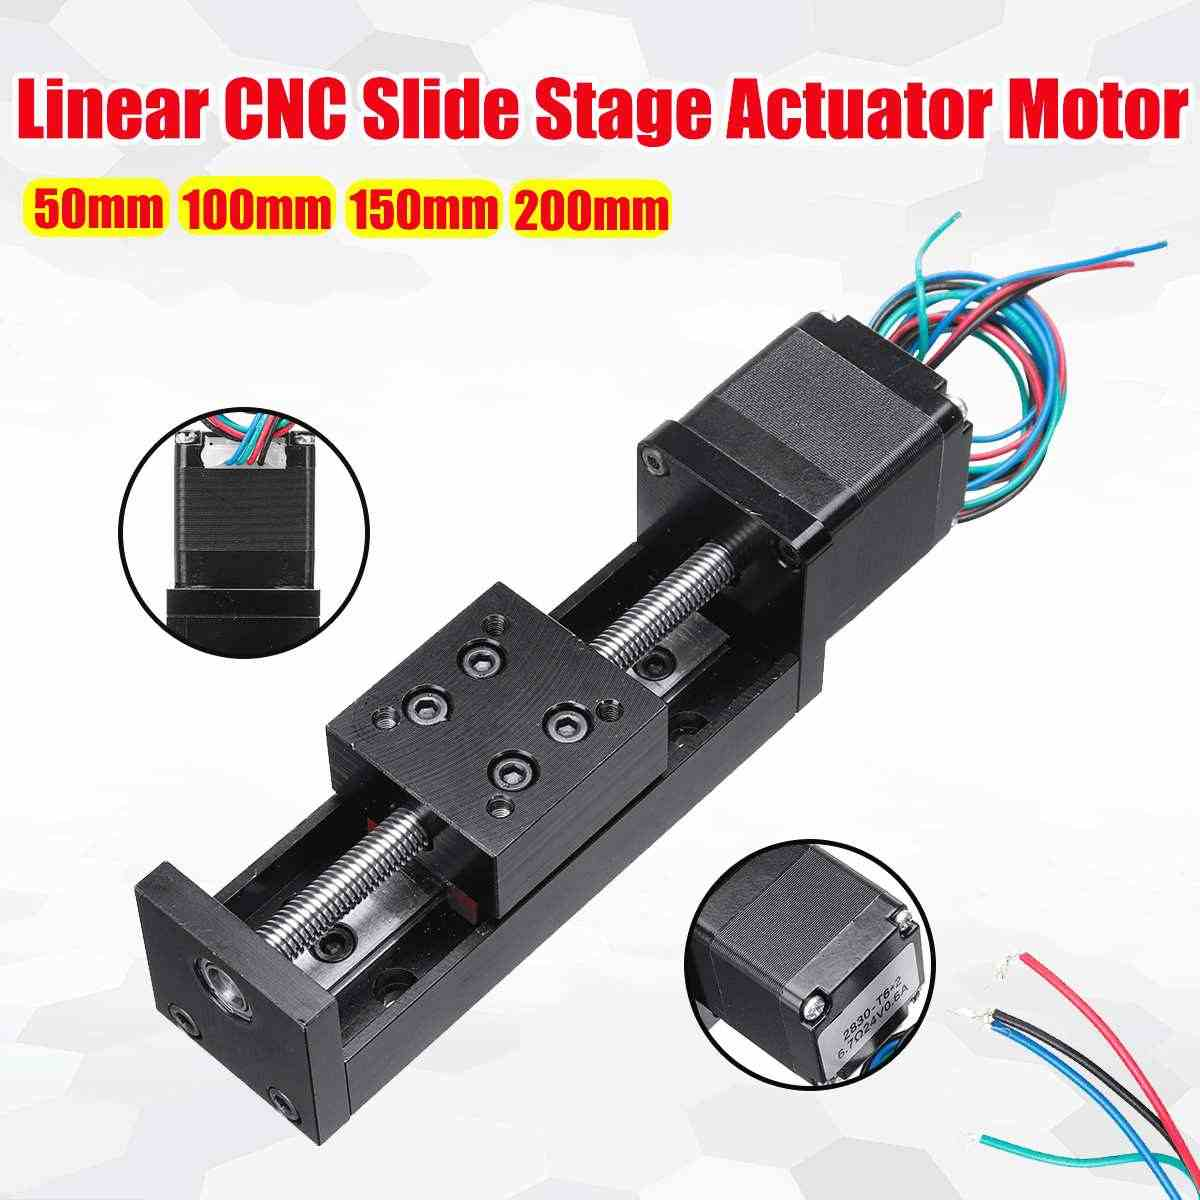 CNC Linearท่องเที่ยวStage Rail Motionสไลด์Actuator 50/100/150/200มม.T6 * 2มอเตอร์Stepperจังหวะสำหรับ3Dเครื่องพิมพ์XYZ